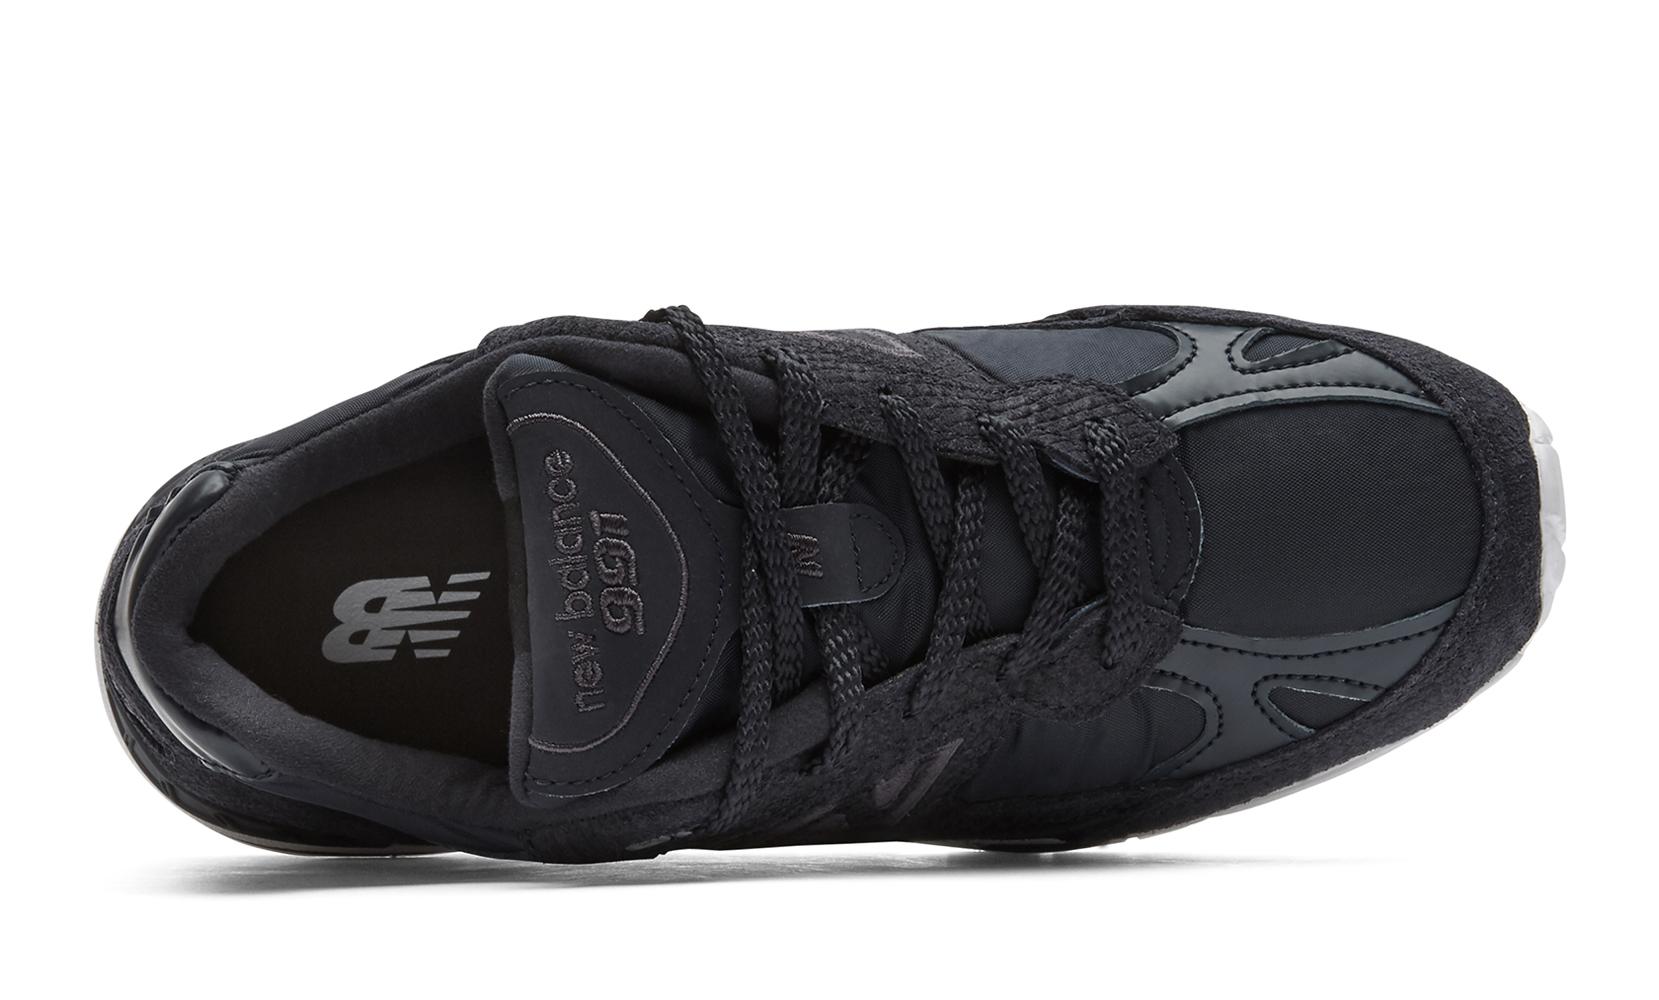 Жіноче взуття повсякденне New Balance 991 Made in UK W991RNV | New Balance